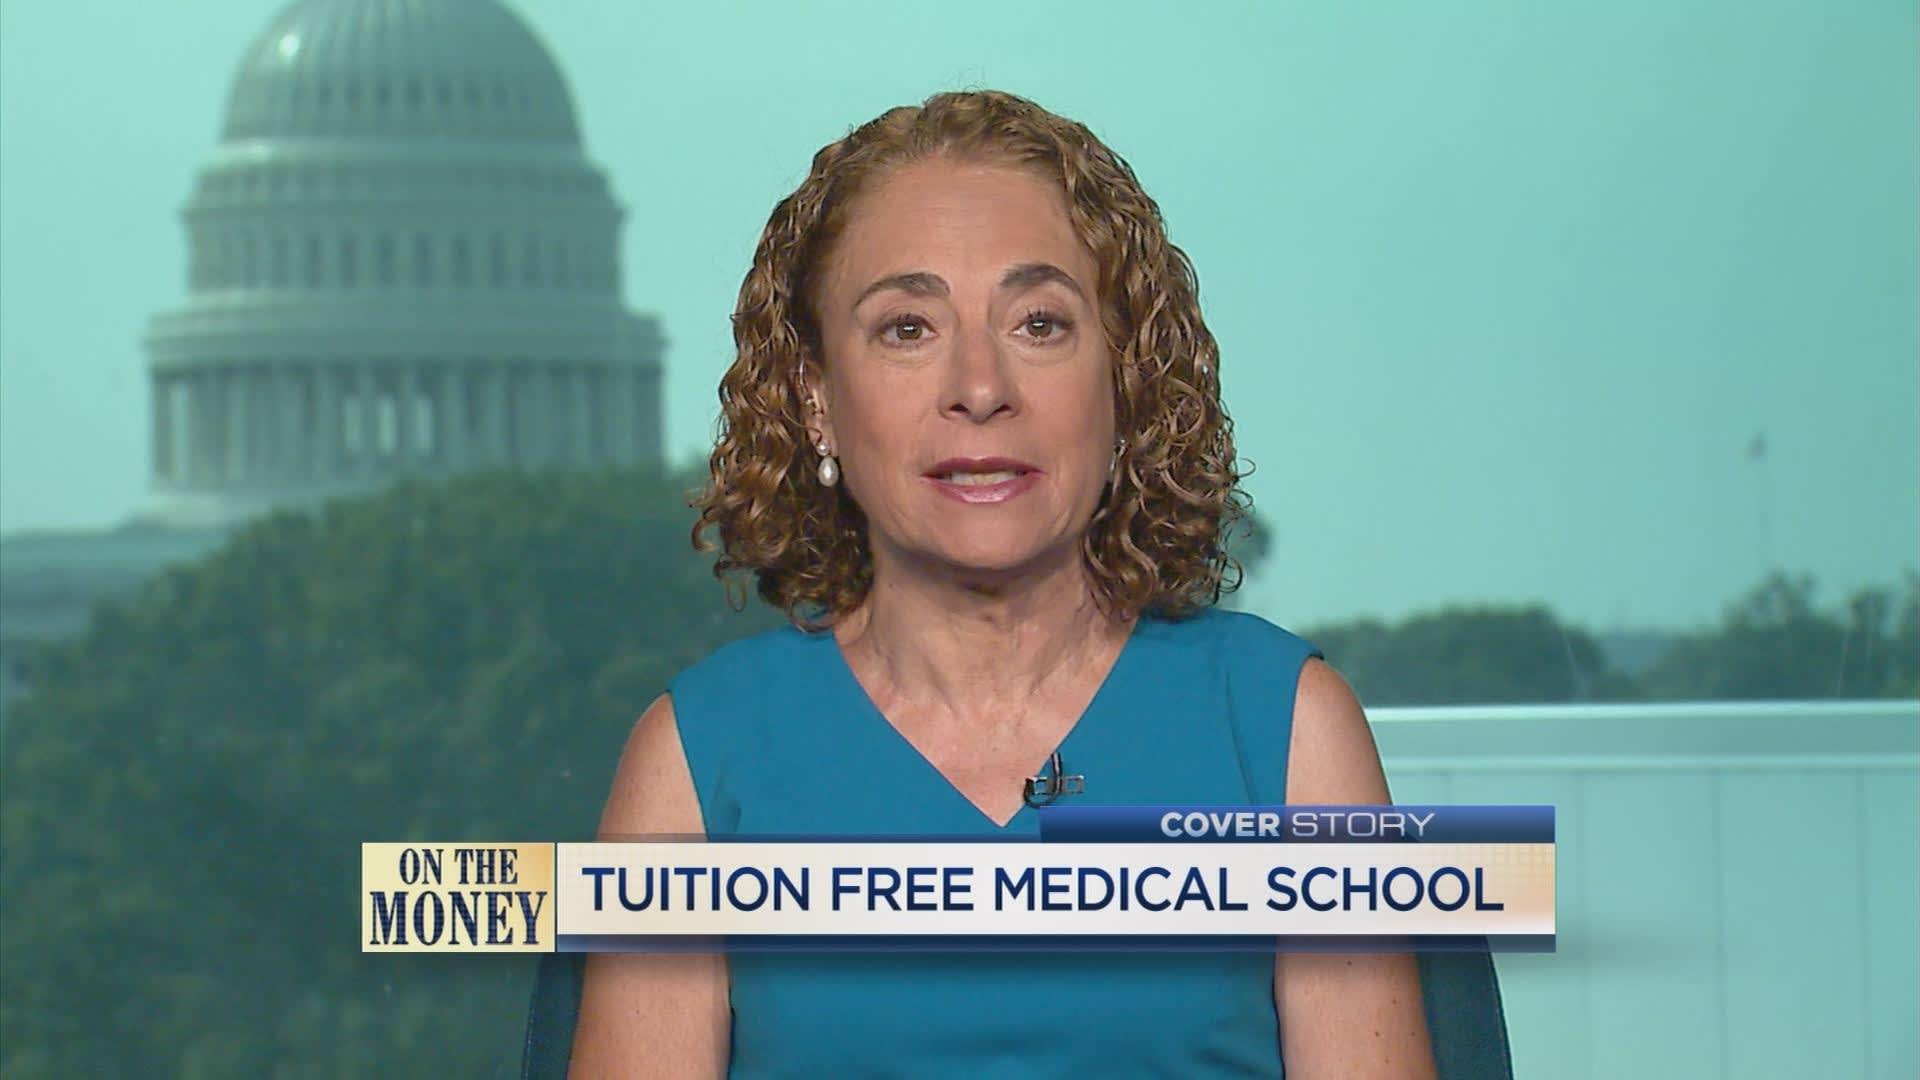 Free medical school